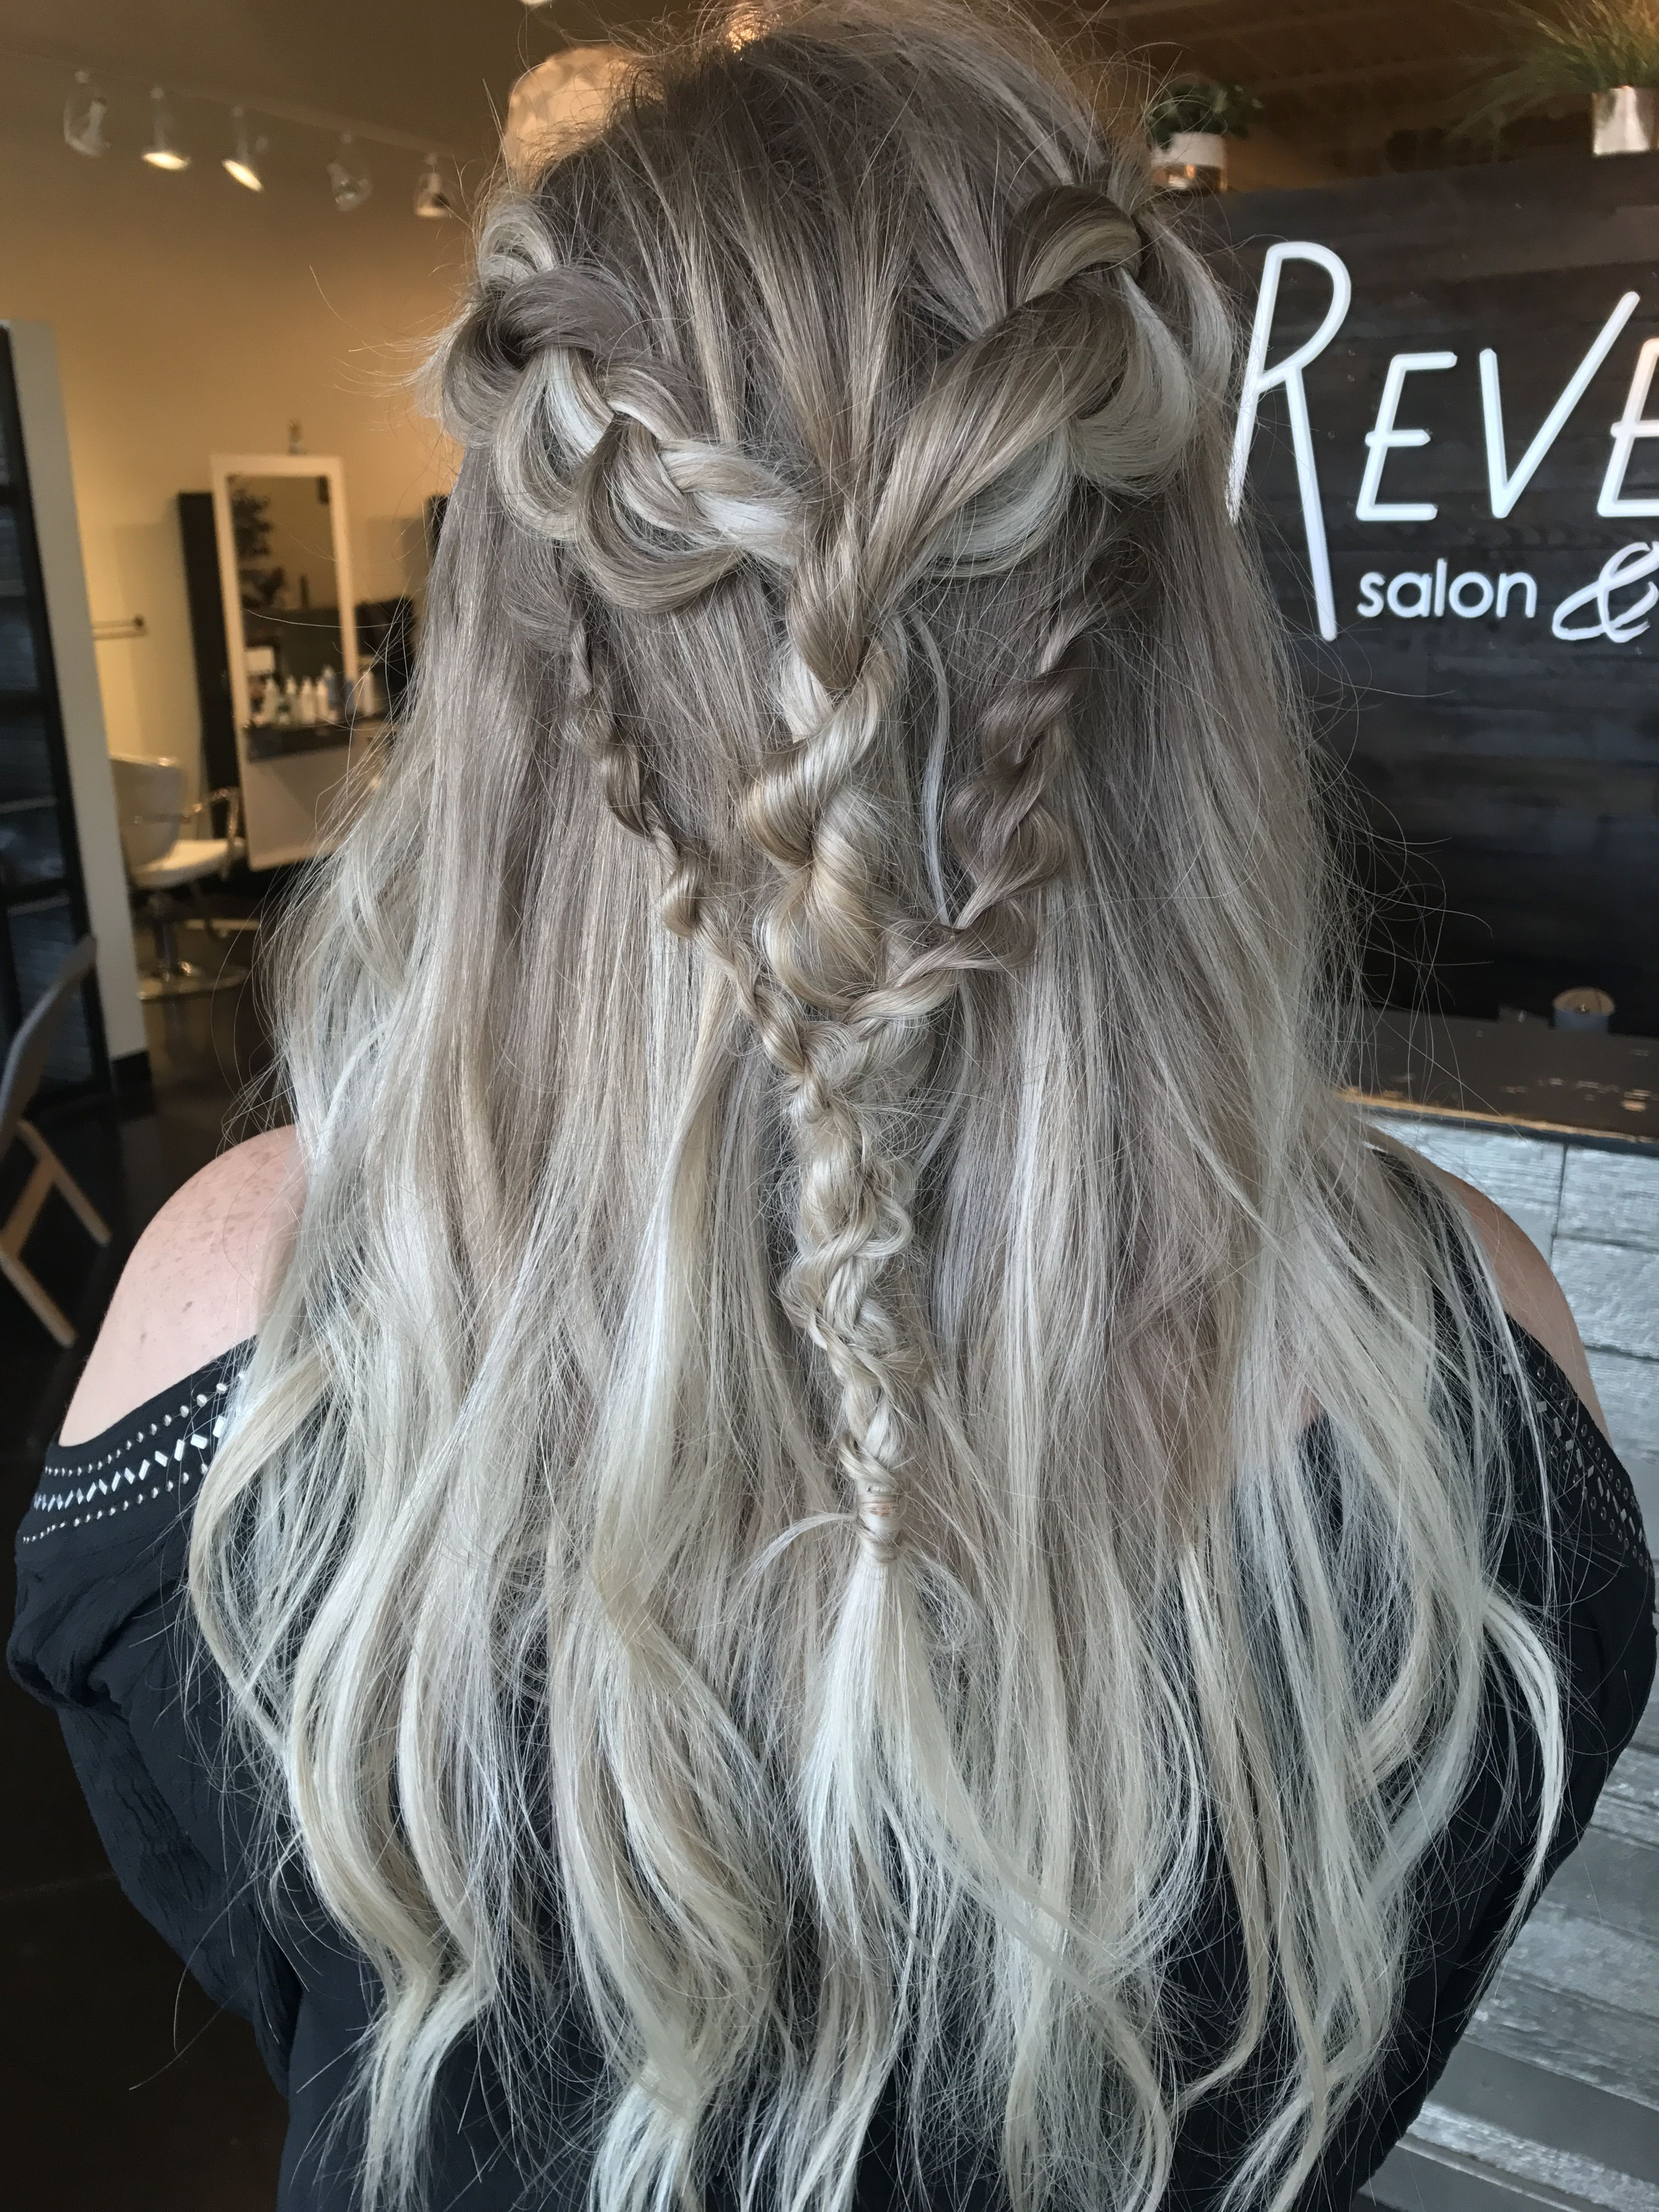 Braids and Waves hairbynatashafehlhaber Reveal Salon and